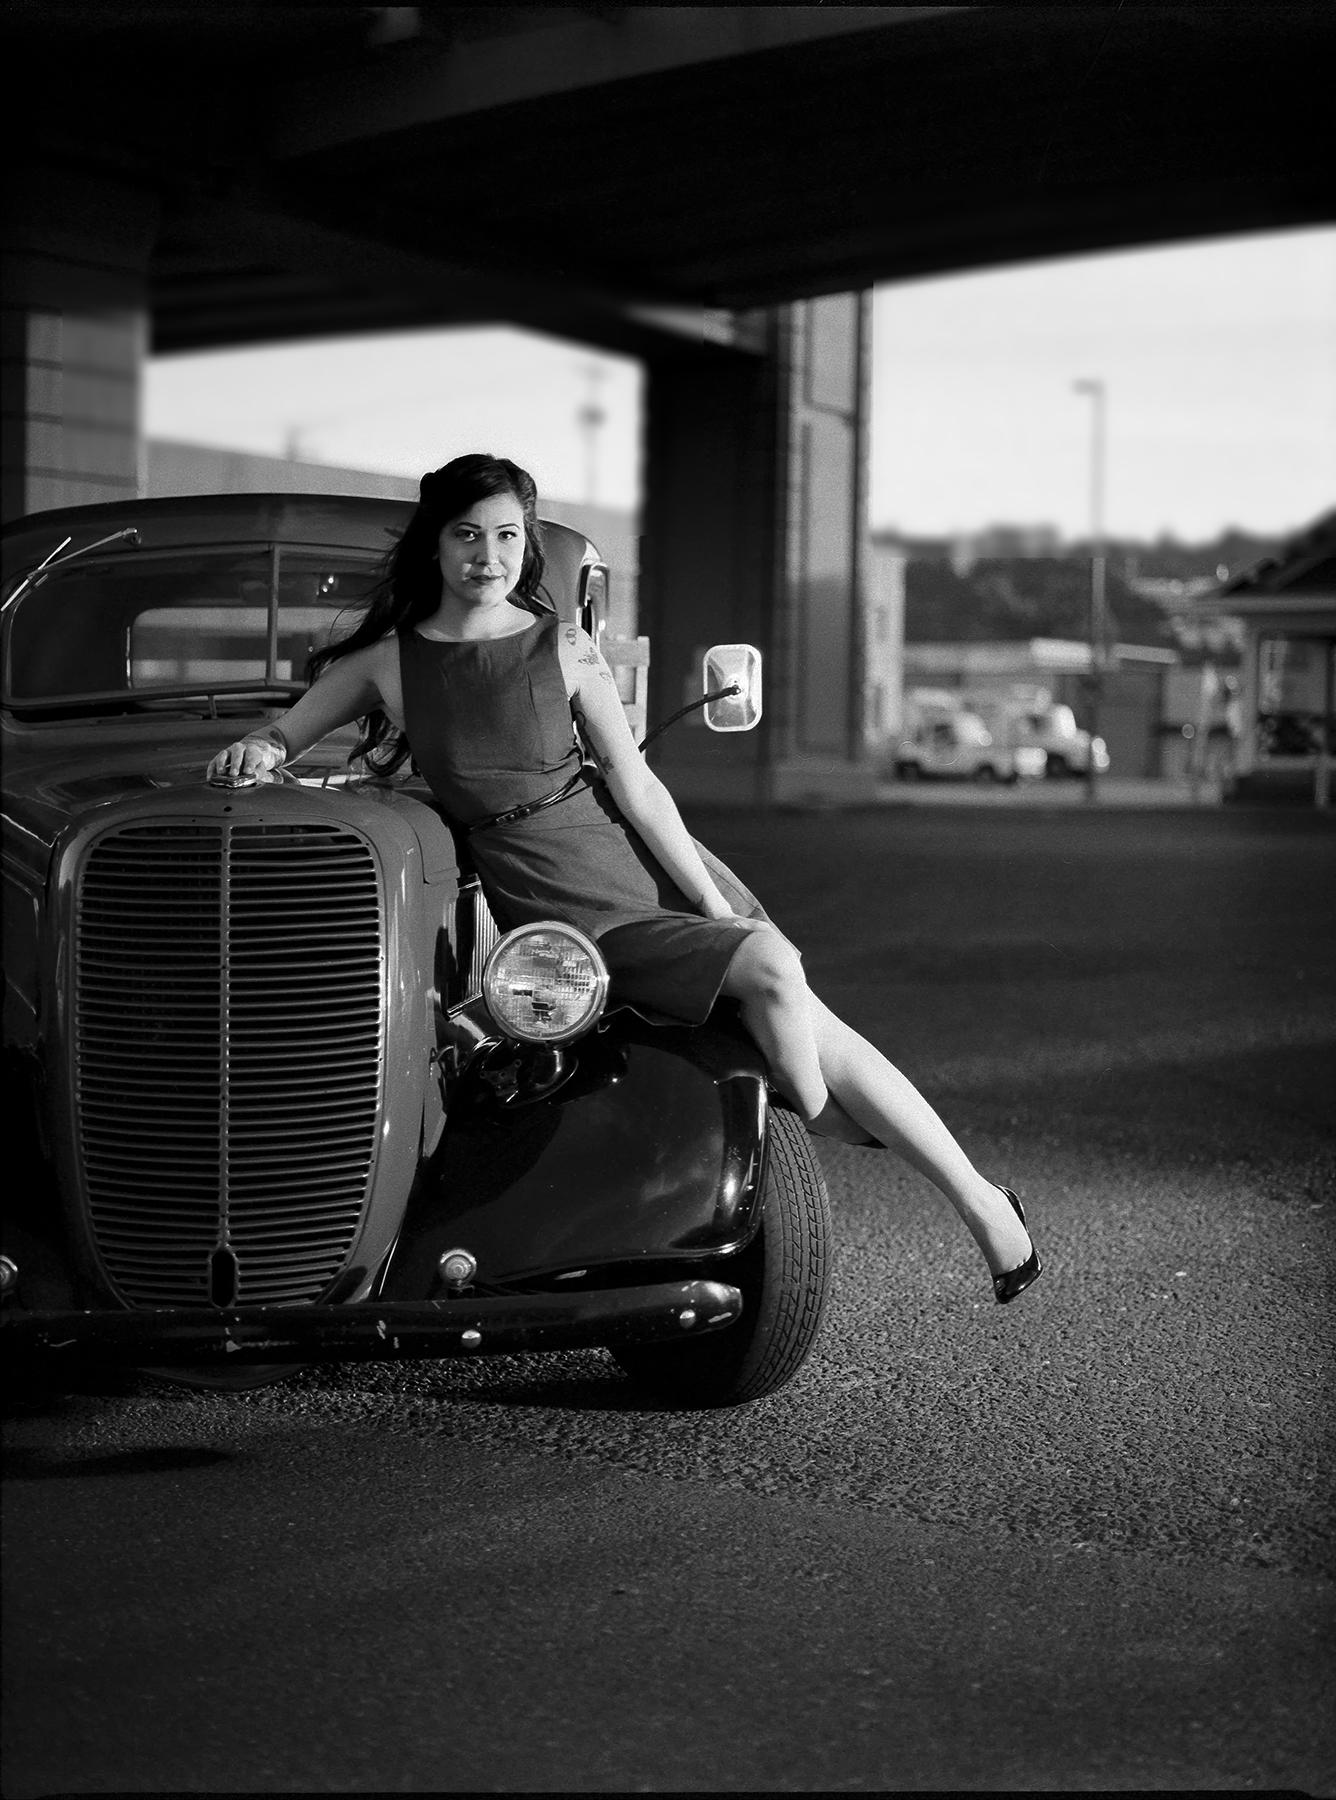 Jess-And-The-Old-Truck_Mamiya645AFDII_Kelly-ShaneFuller.jpg